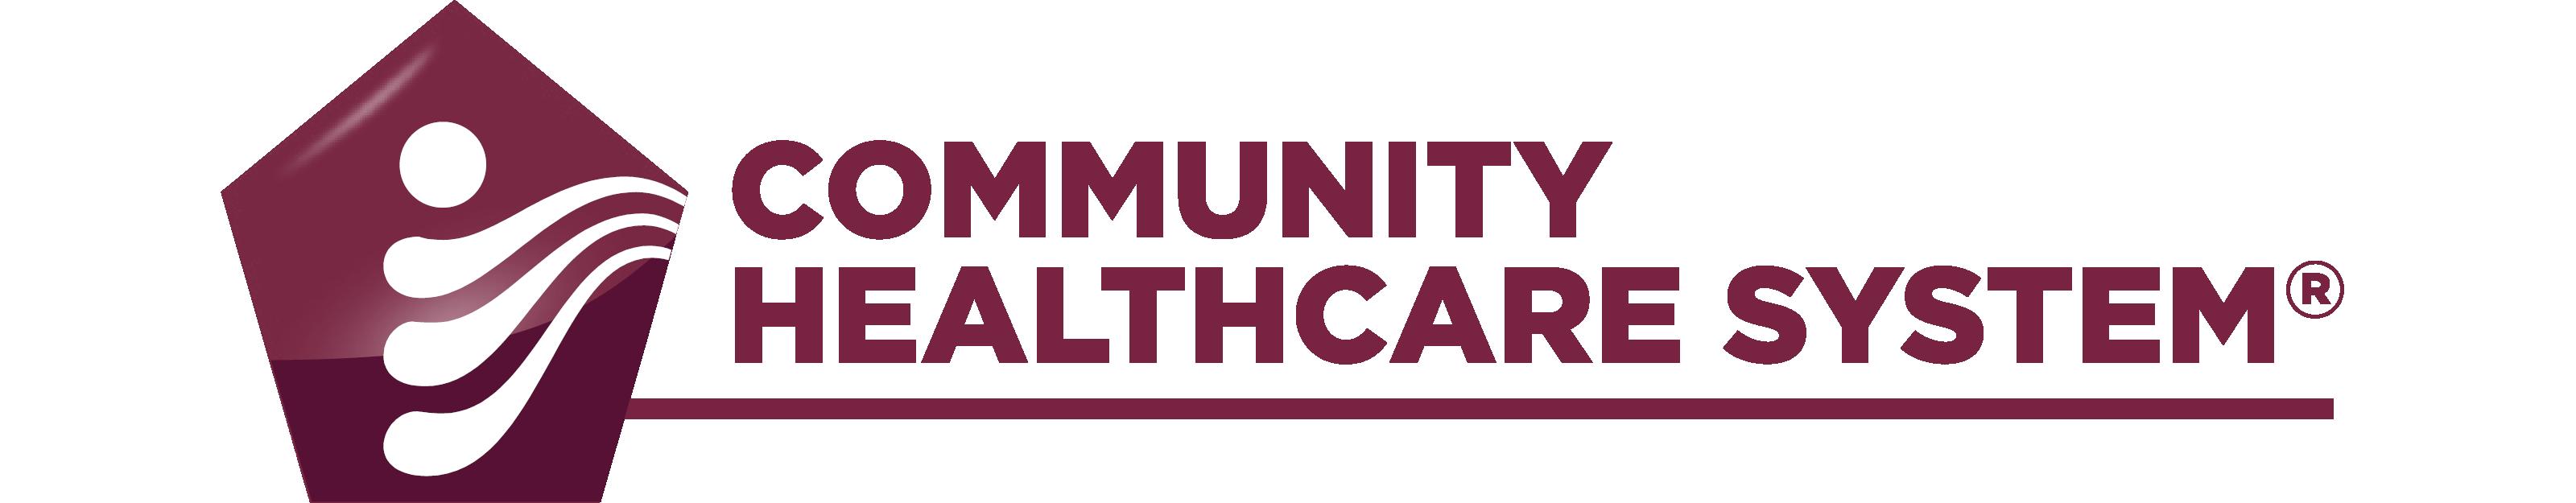 CommunityHealthcareSystem